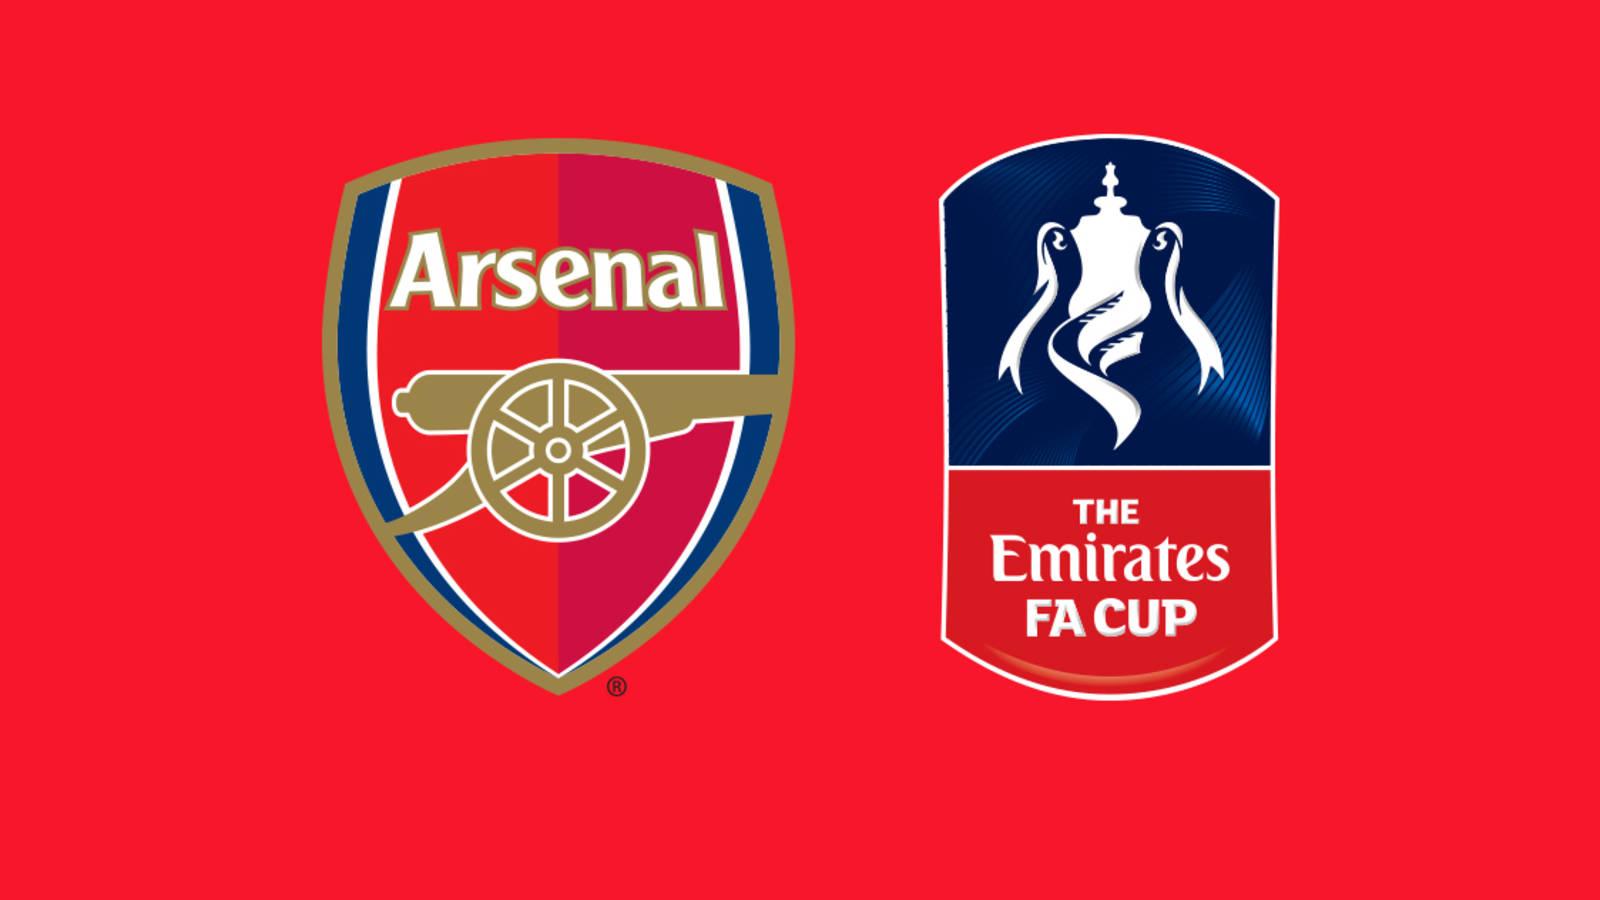 We Ll Face Man City In Emirates Fa Cup Semi Final Emirates Fa Cup News Arsenal Com